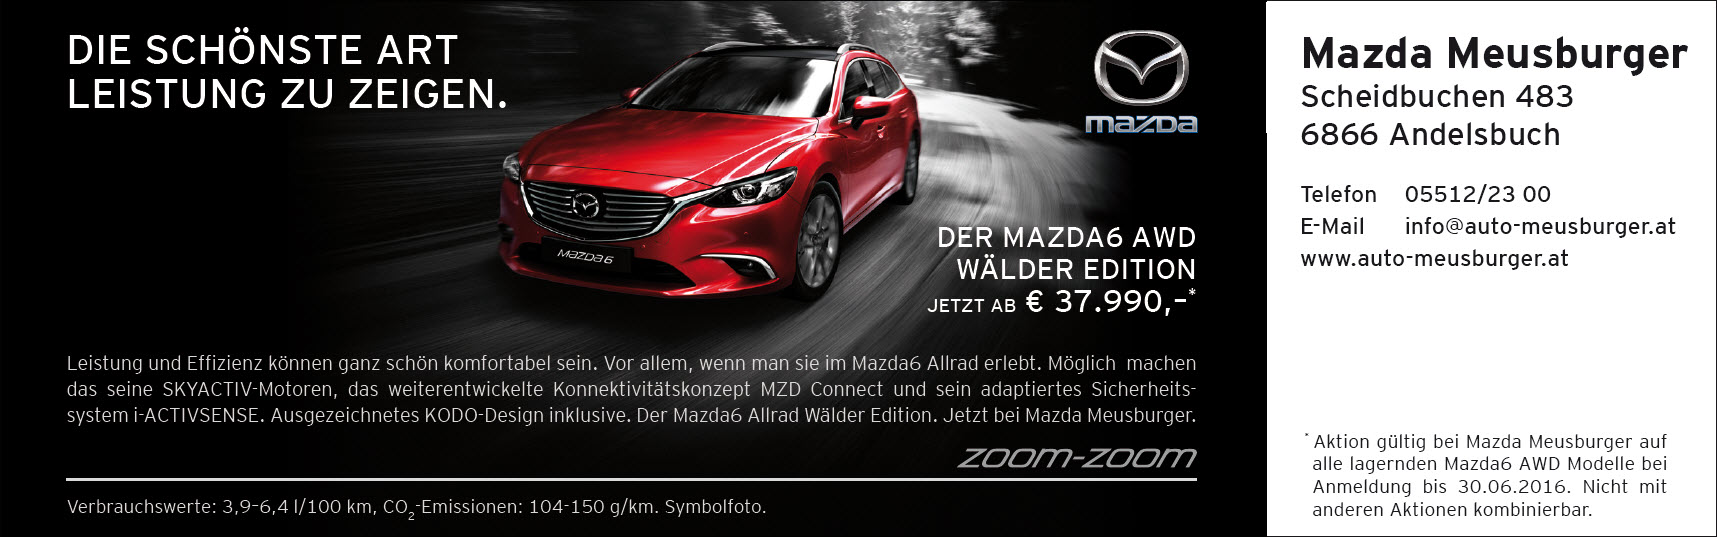 Mazda_Bild